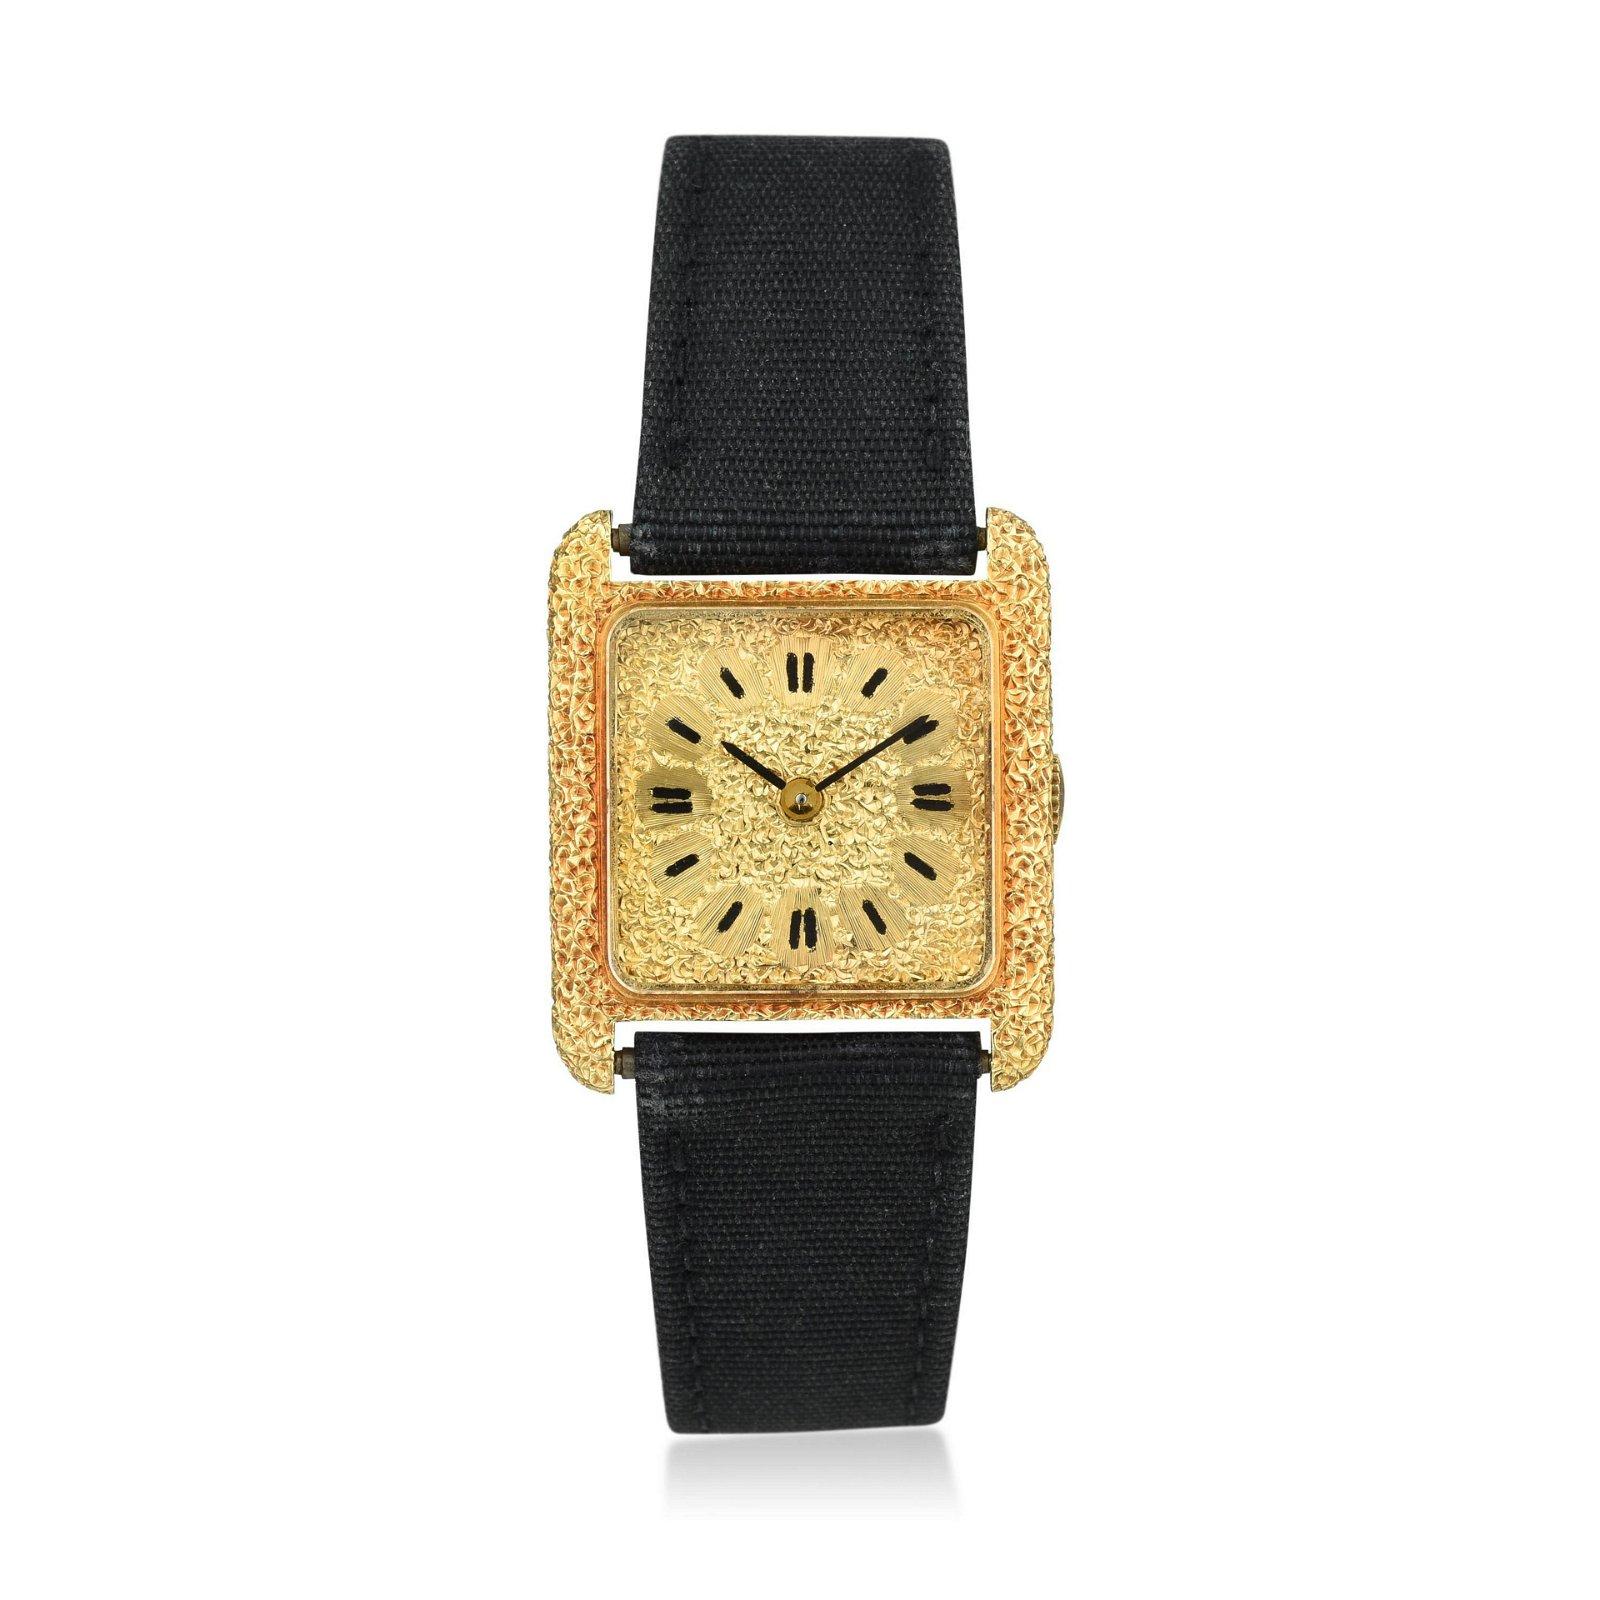 Gianmaria Buccellati Ladies Watch in 18K Gold